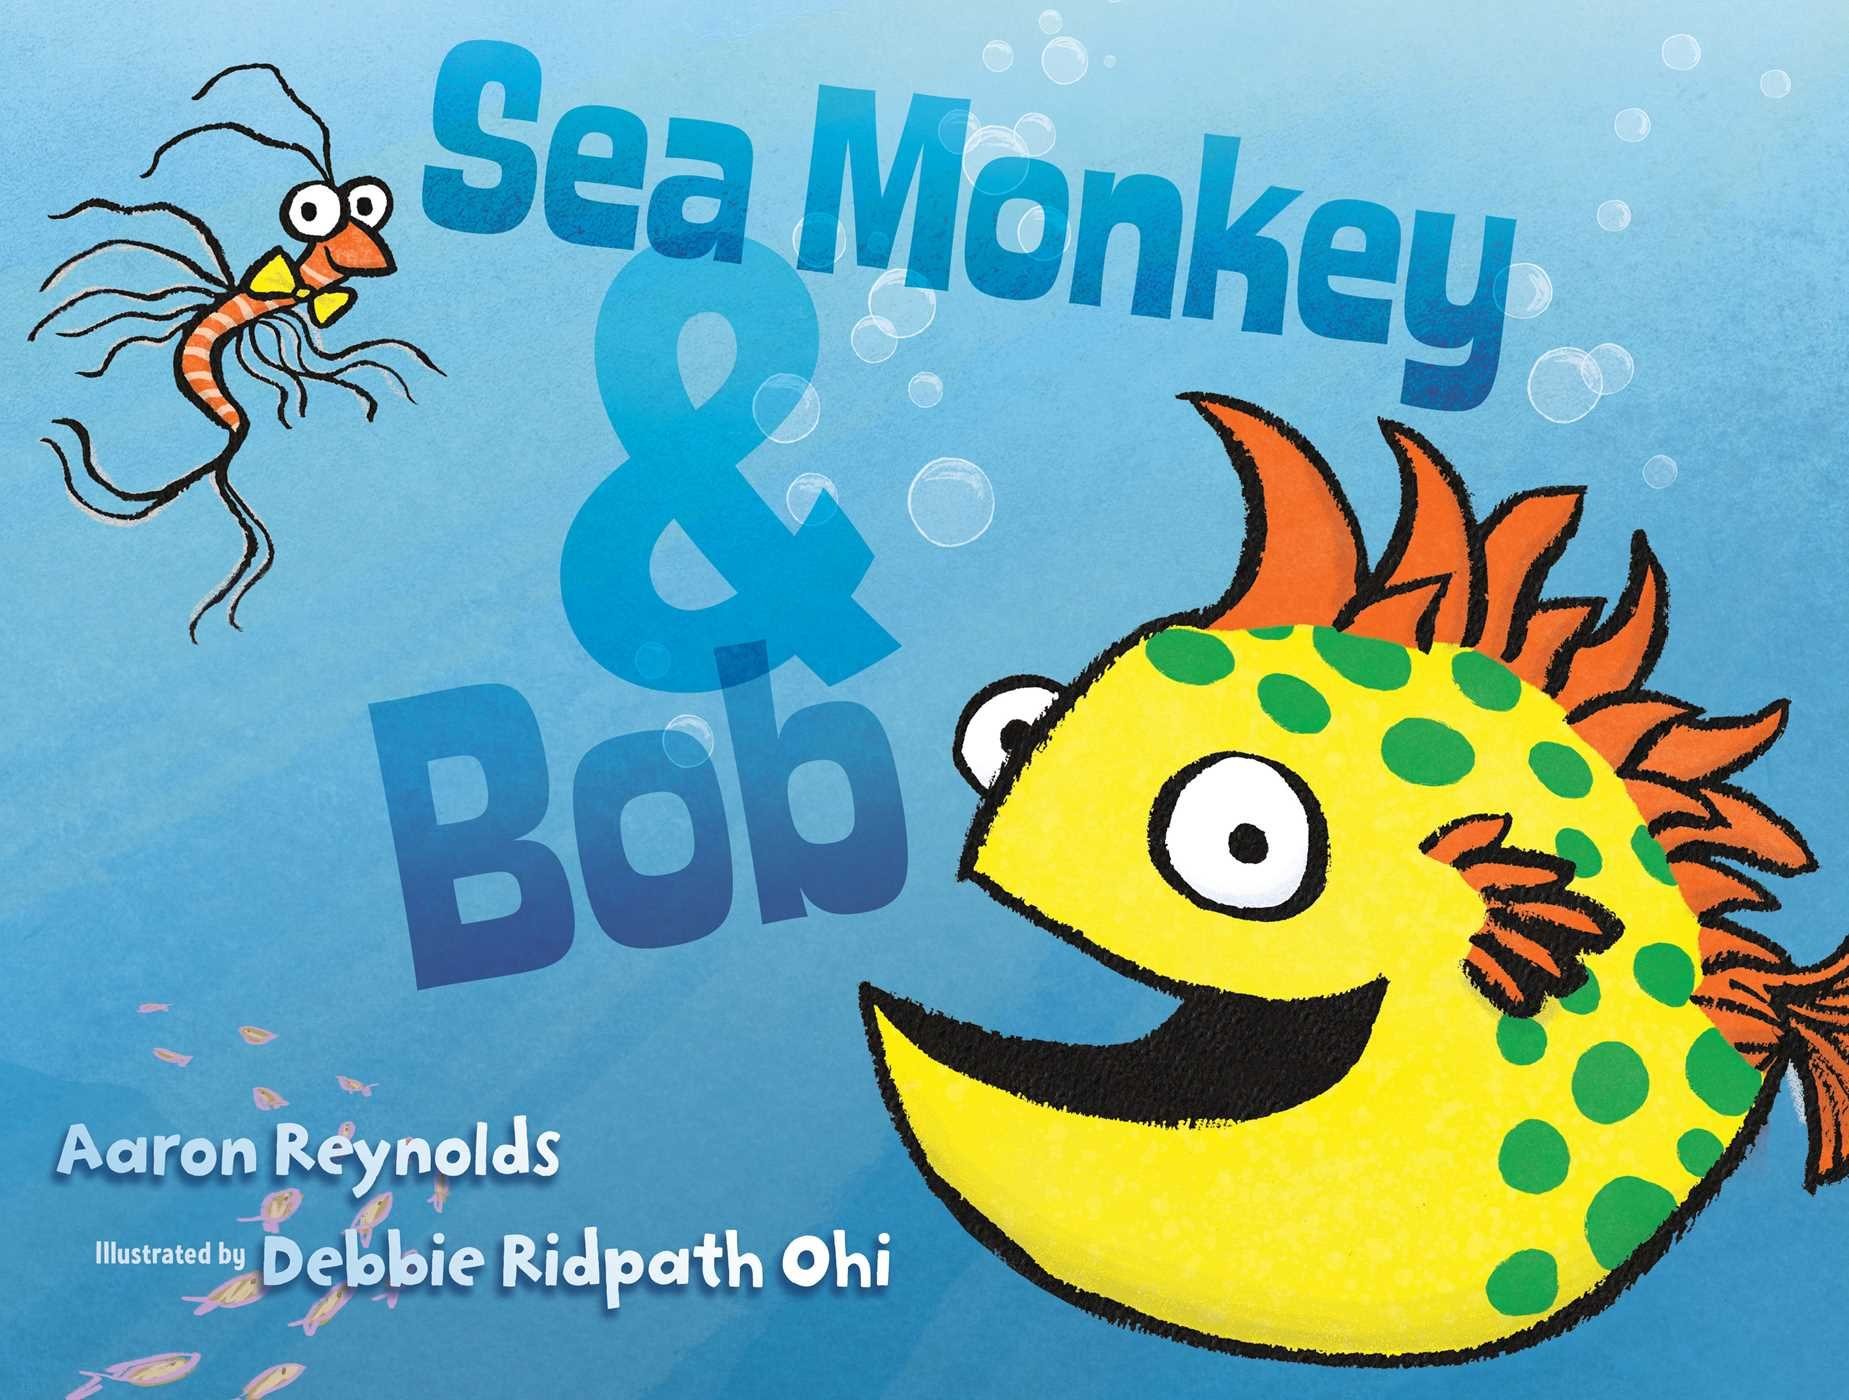 Sea Monkey & Bob: Aaron Reynolds, Debbie Ridpath Ohi